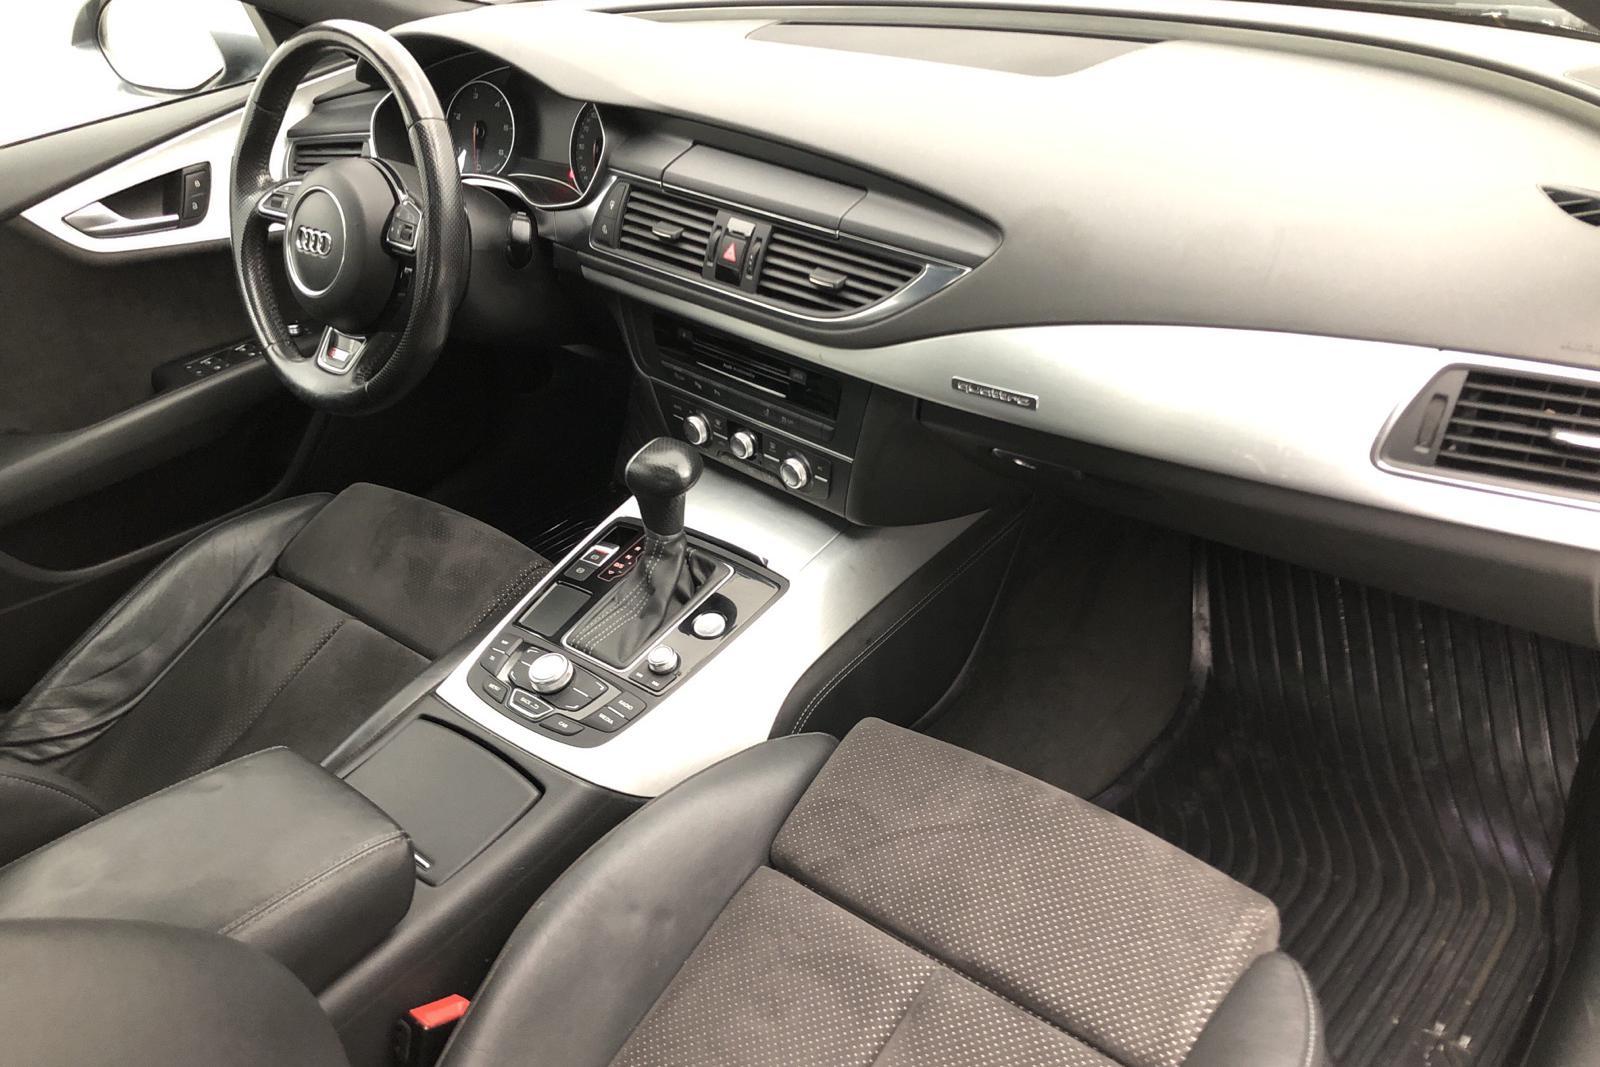 Audi A7 Sportback 3.0 TDI quattro TipTronic (313hk) - 167 000 km - Automatic - gray - 2013